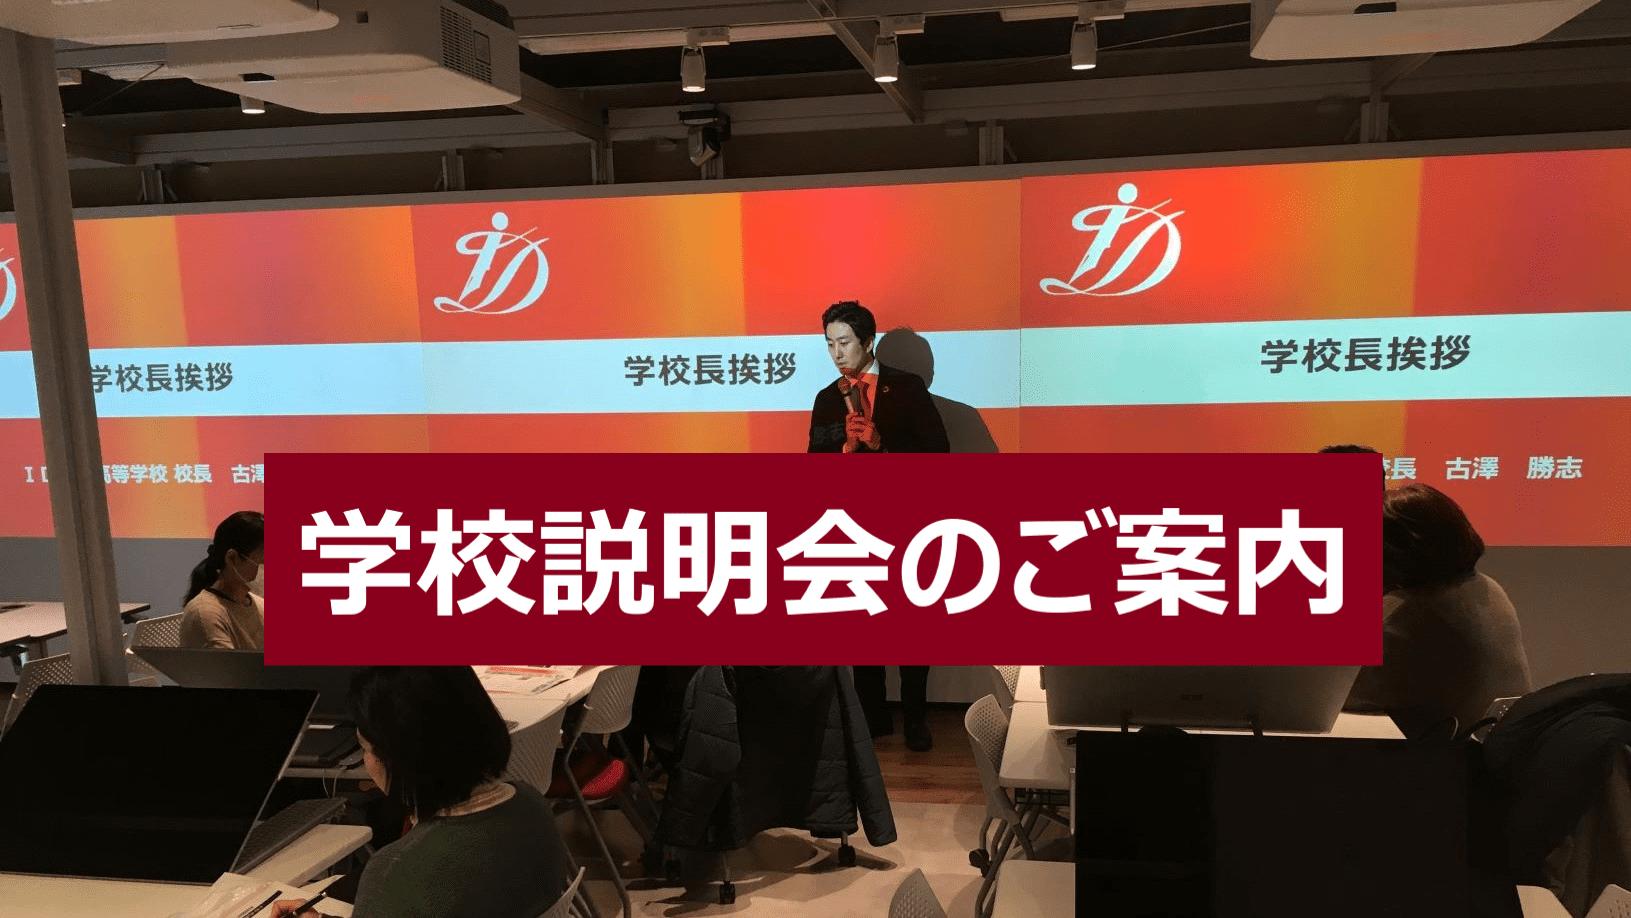 ID学園高等学校 独自の学校説明会を7月23日(木祝)に追加開催